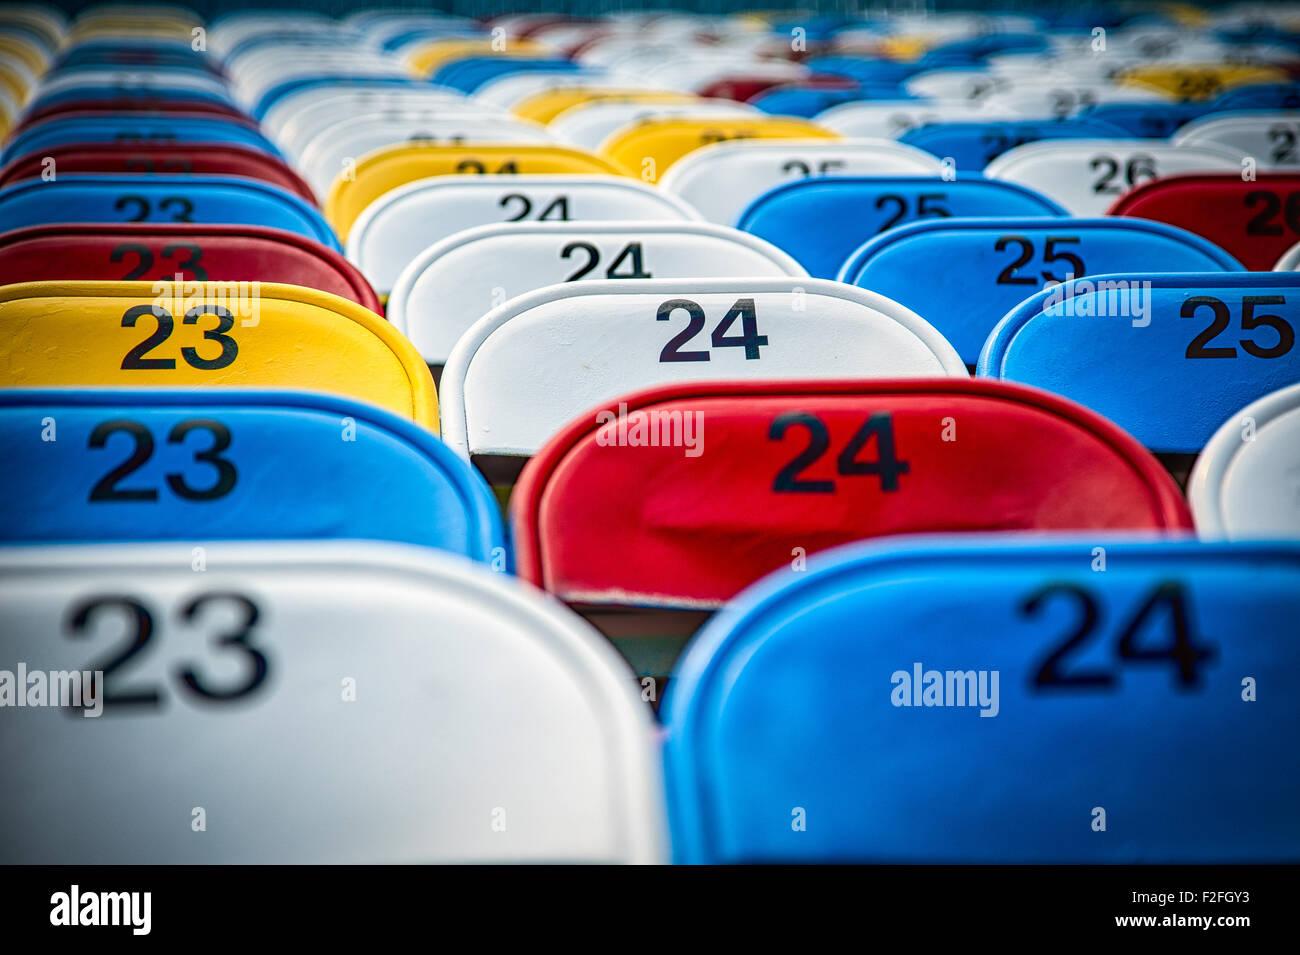 Leere Sitze in einem Stadion, Daytona International Speedway, Daytona Beach, Florida, USA Stockfoto